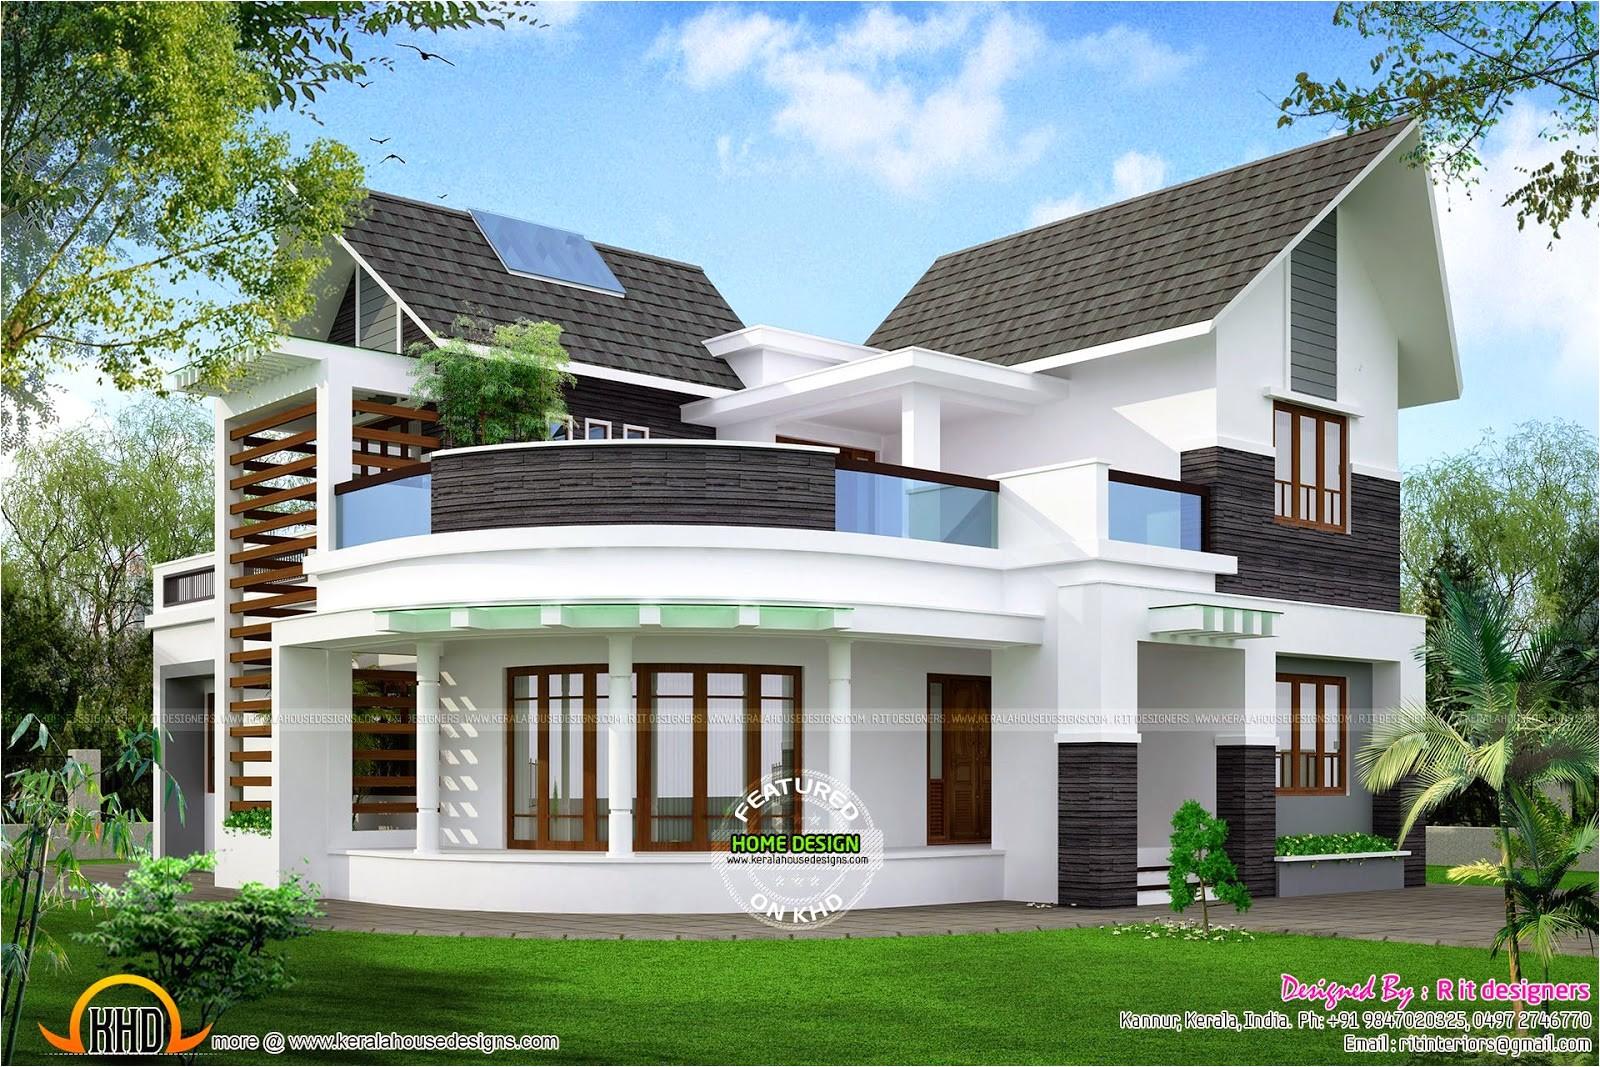 home designs 2015